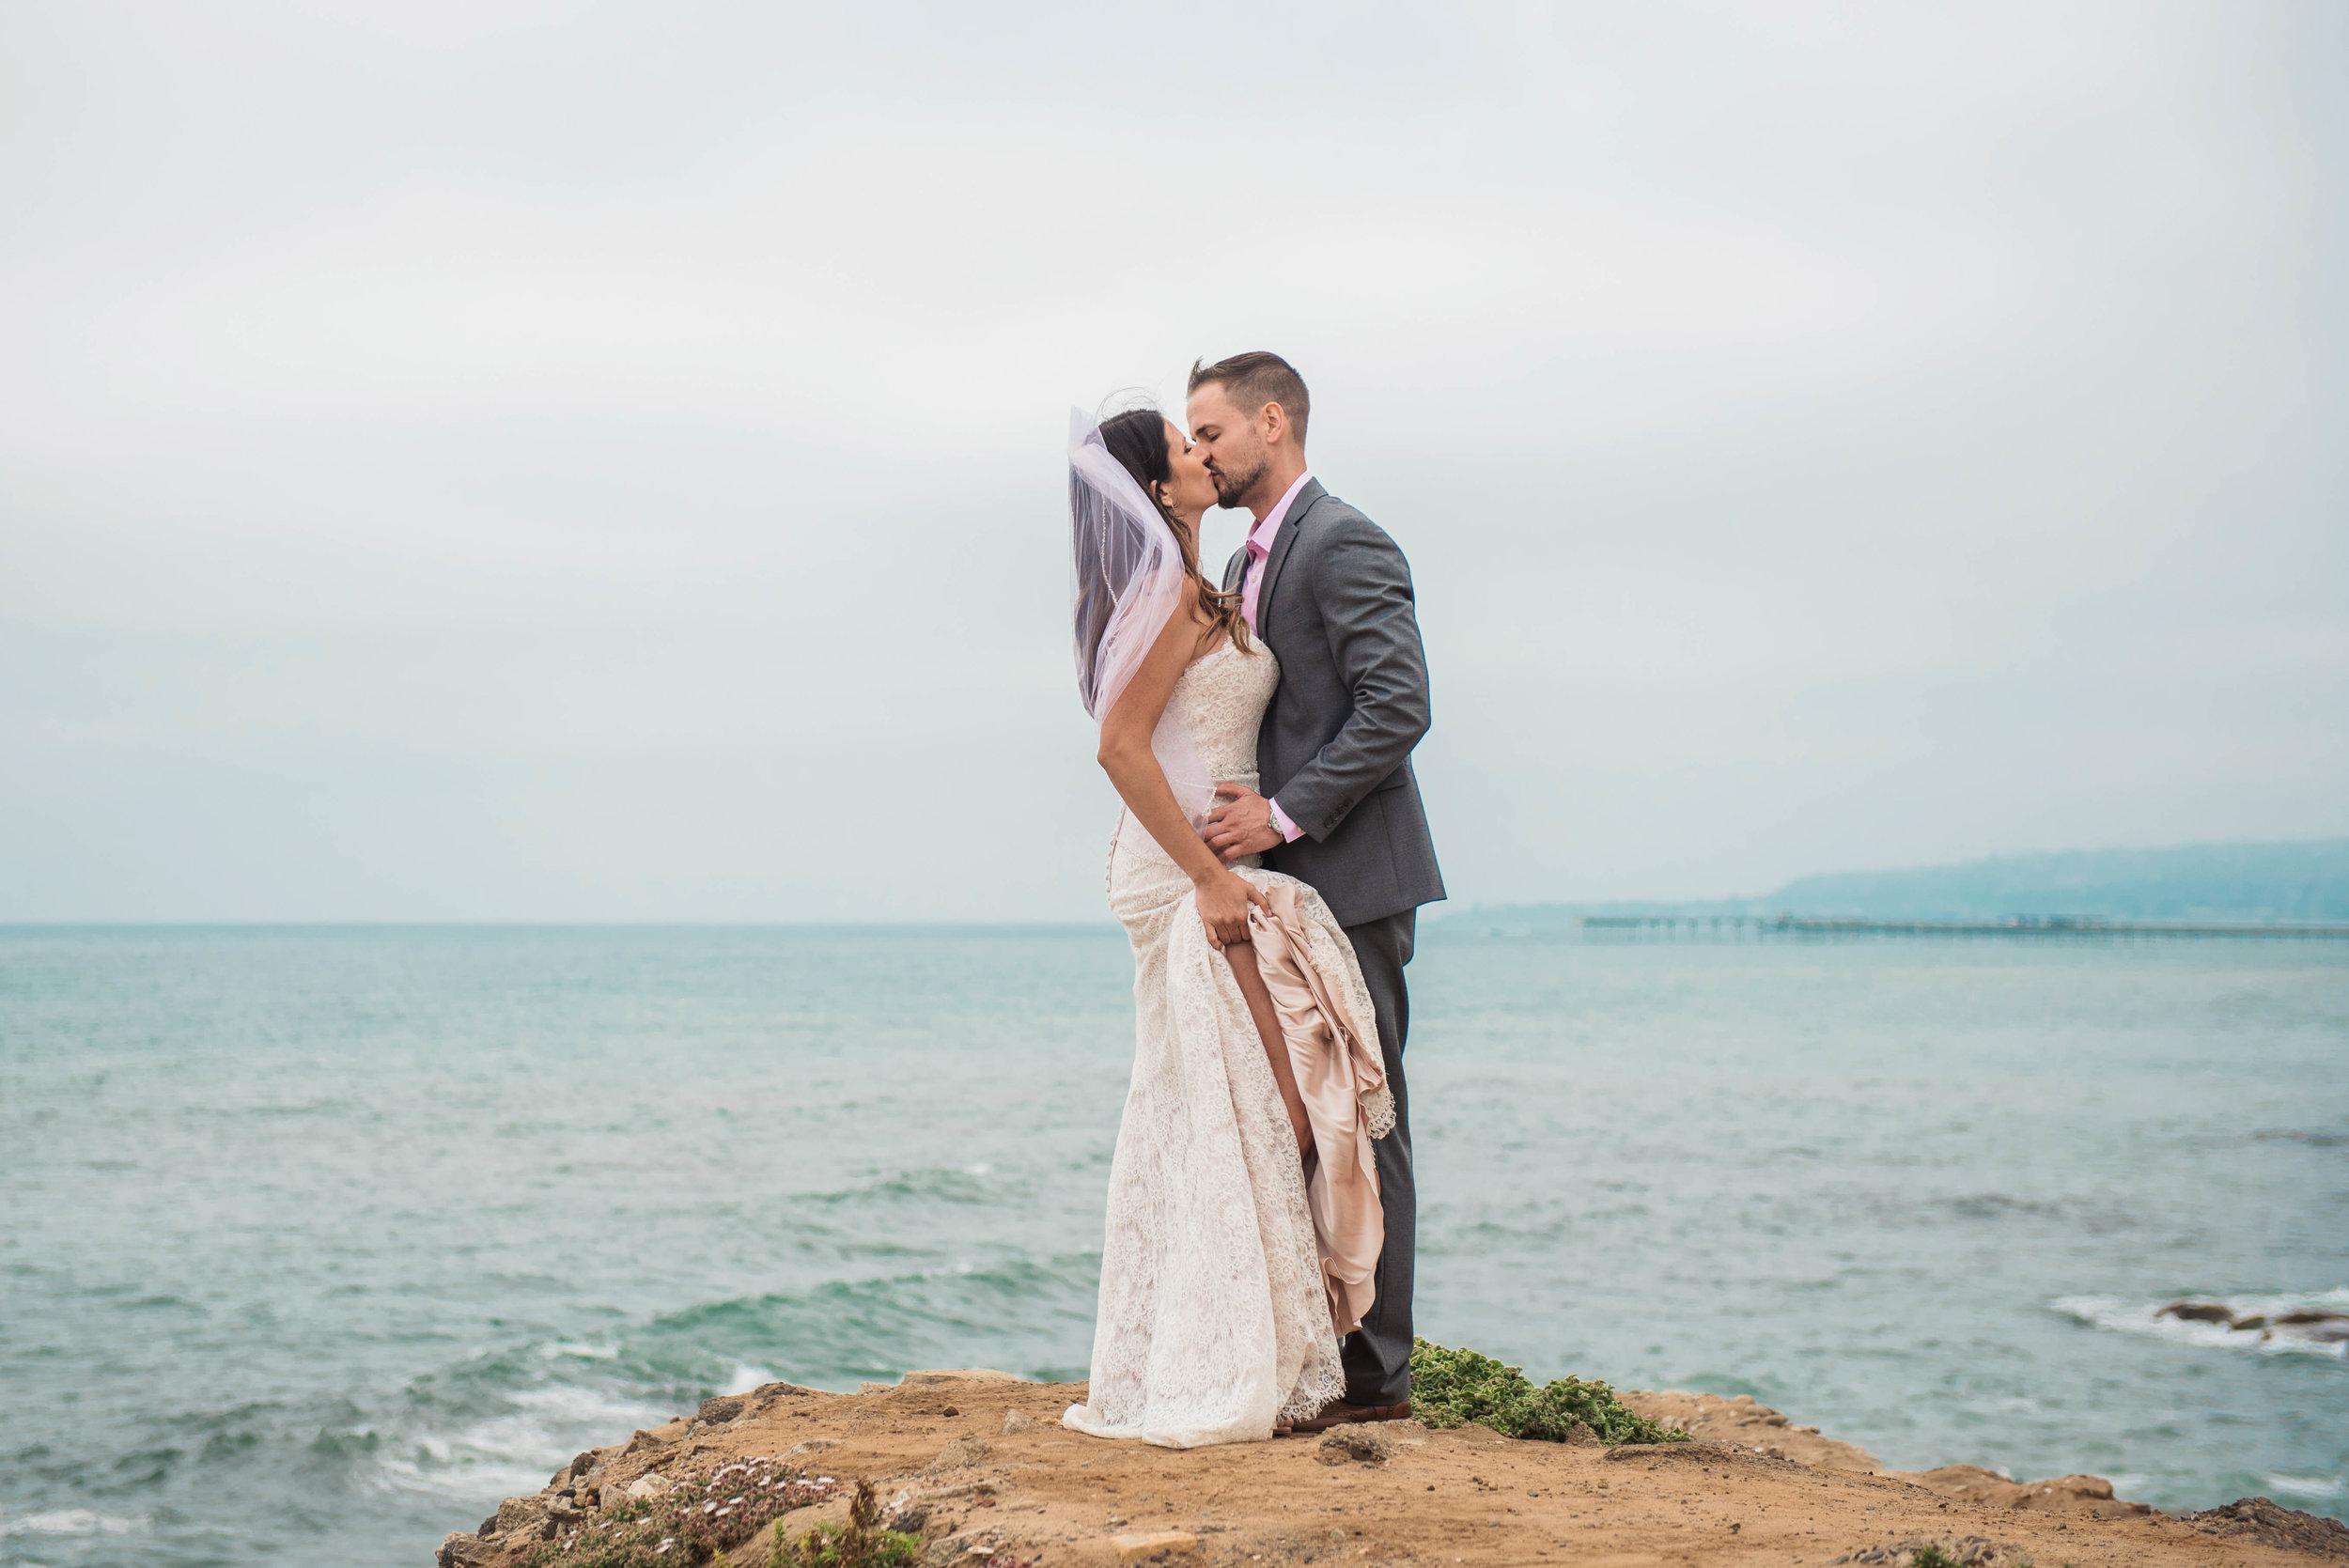 weddingwebsitesmallerpics-313.jpg